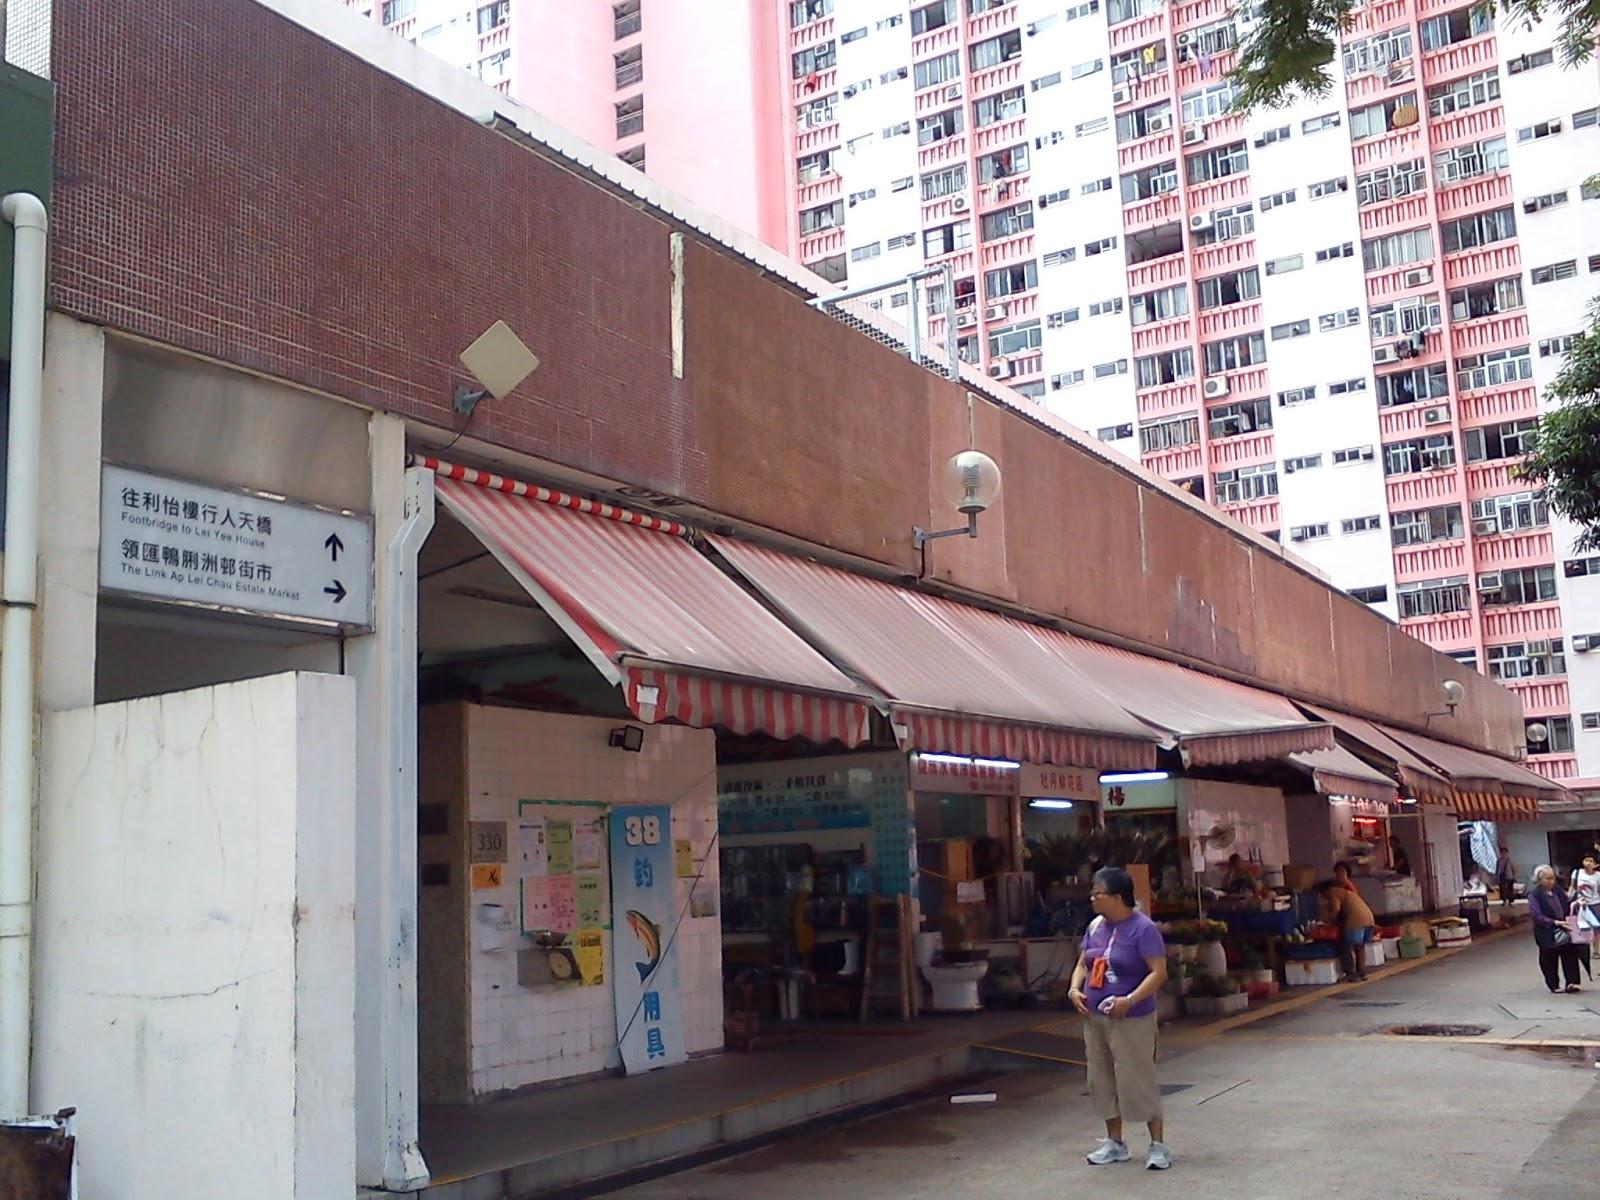 Grassroots O2: [領匯商場] 鴨脷洲邨商舖 @2013-07-06